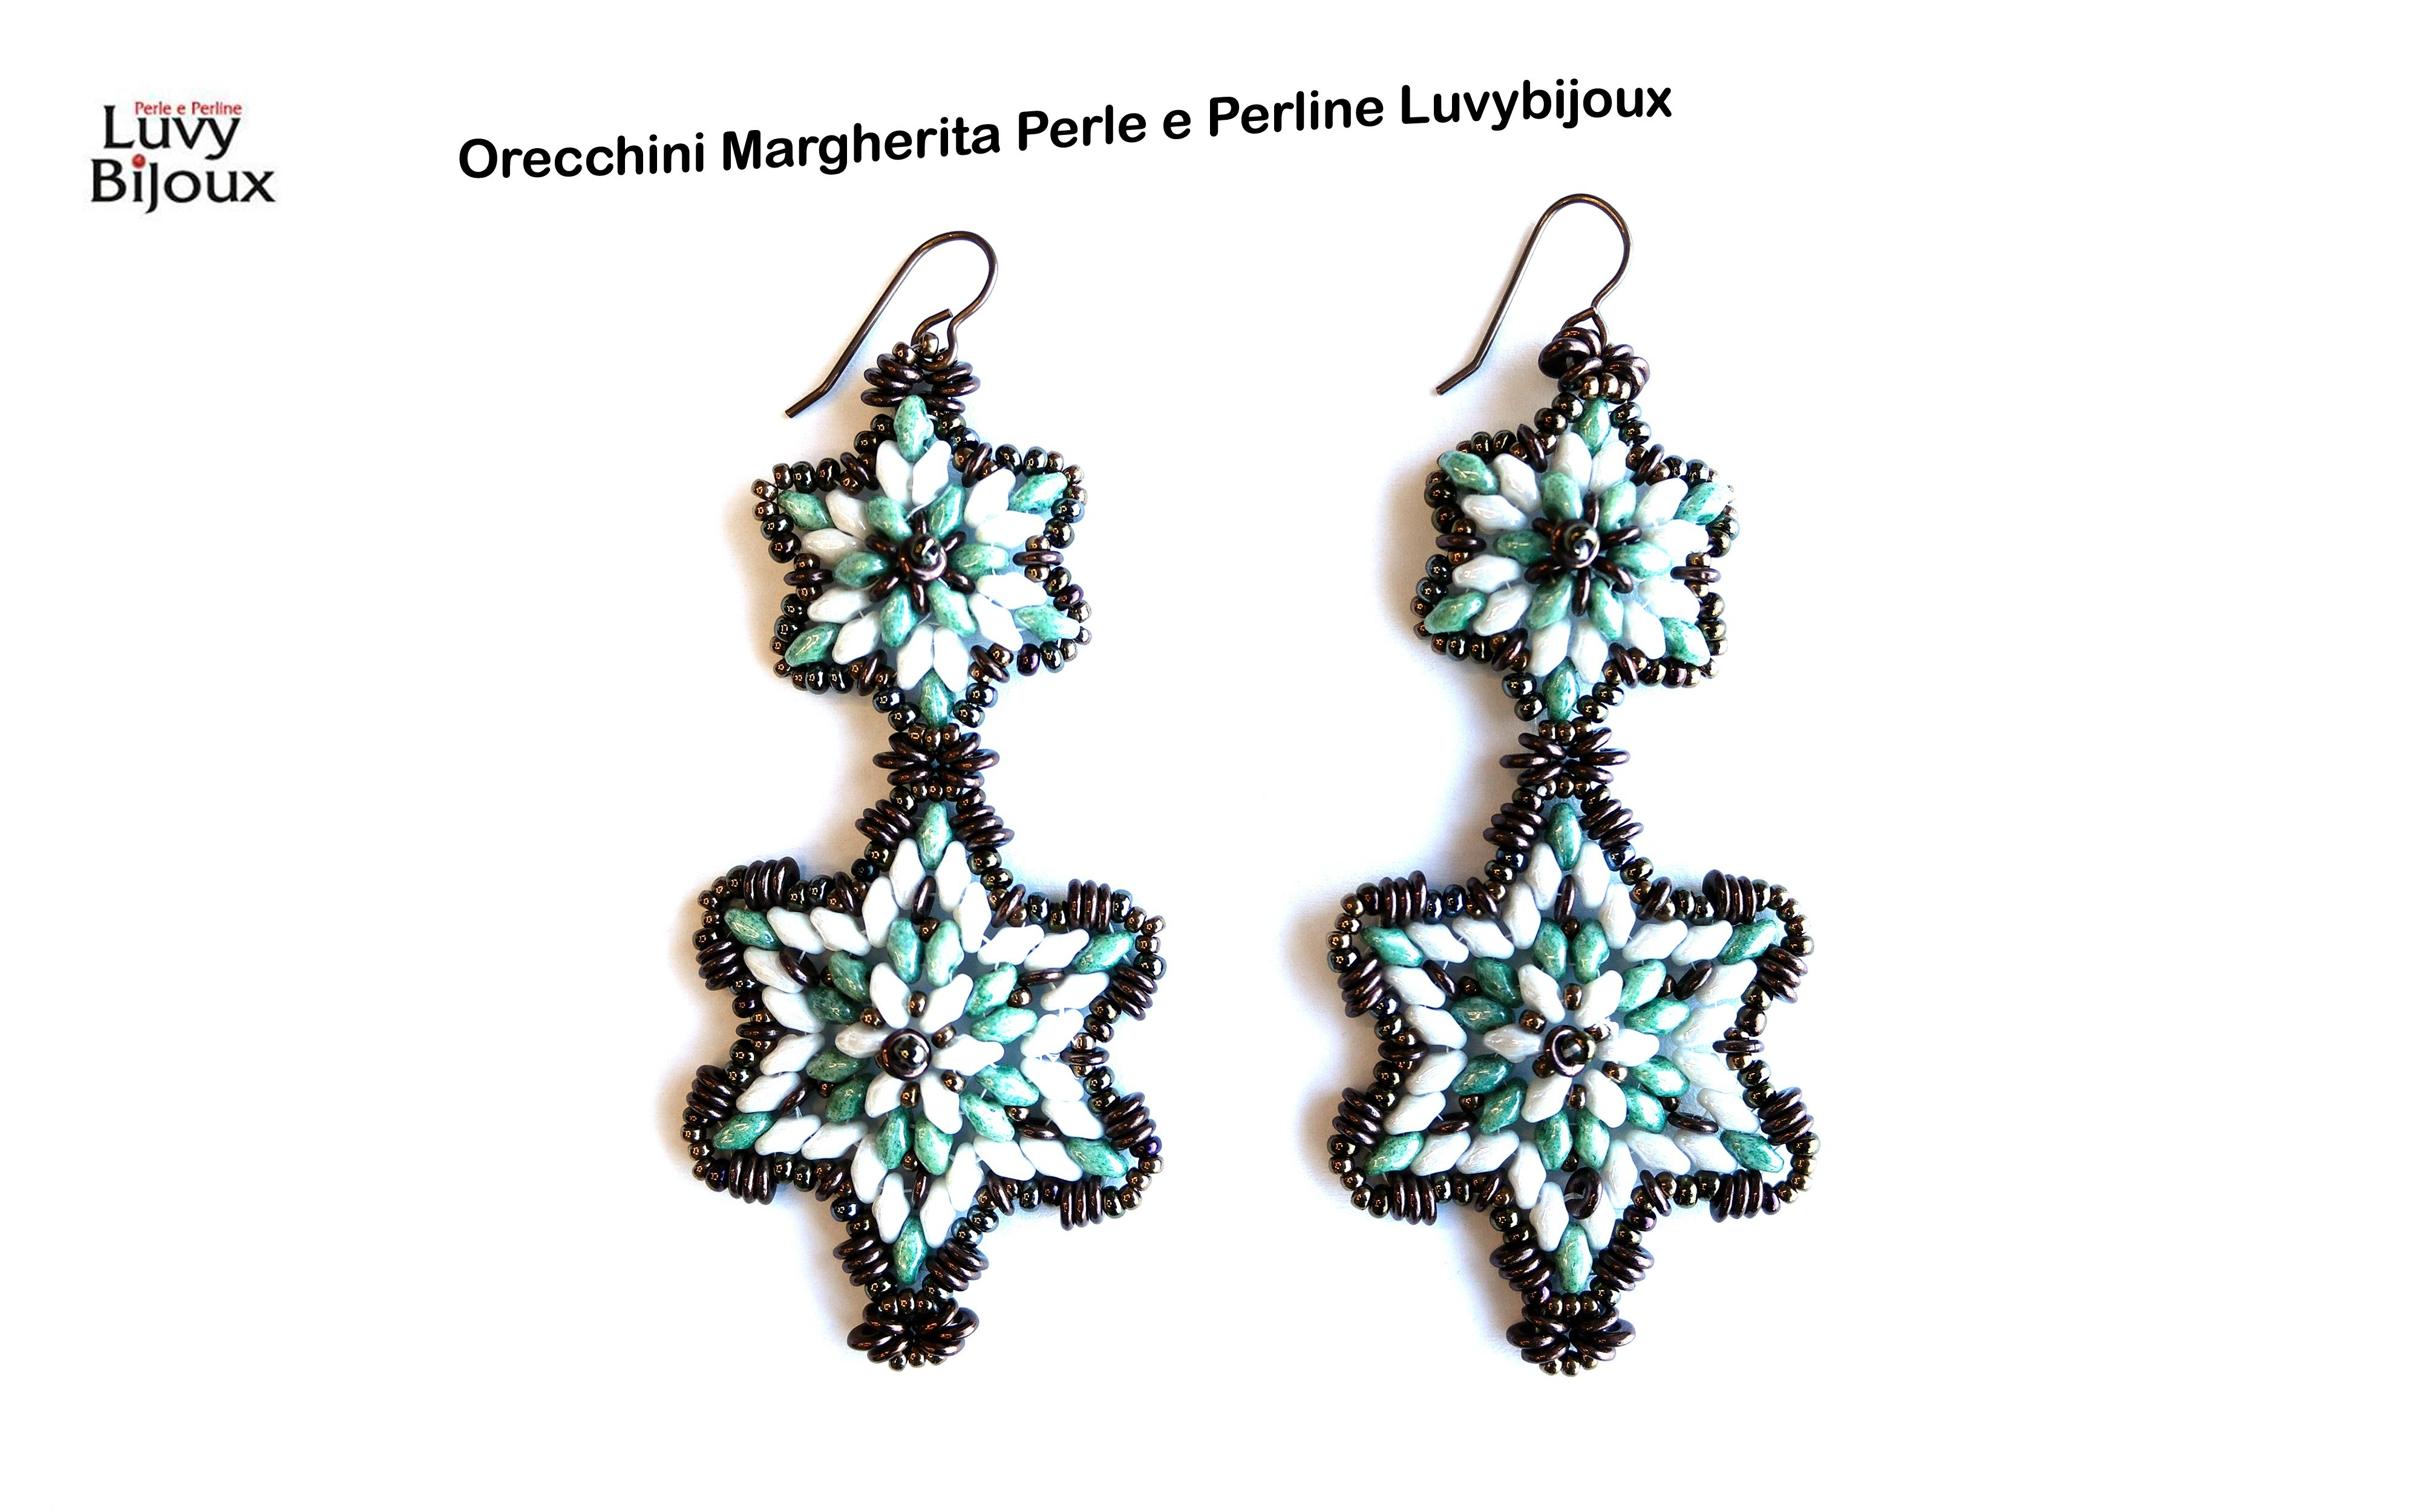 Video Tutorial Orecchini Margherita. Perle e Perline Luvybijoux